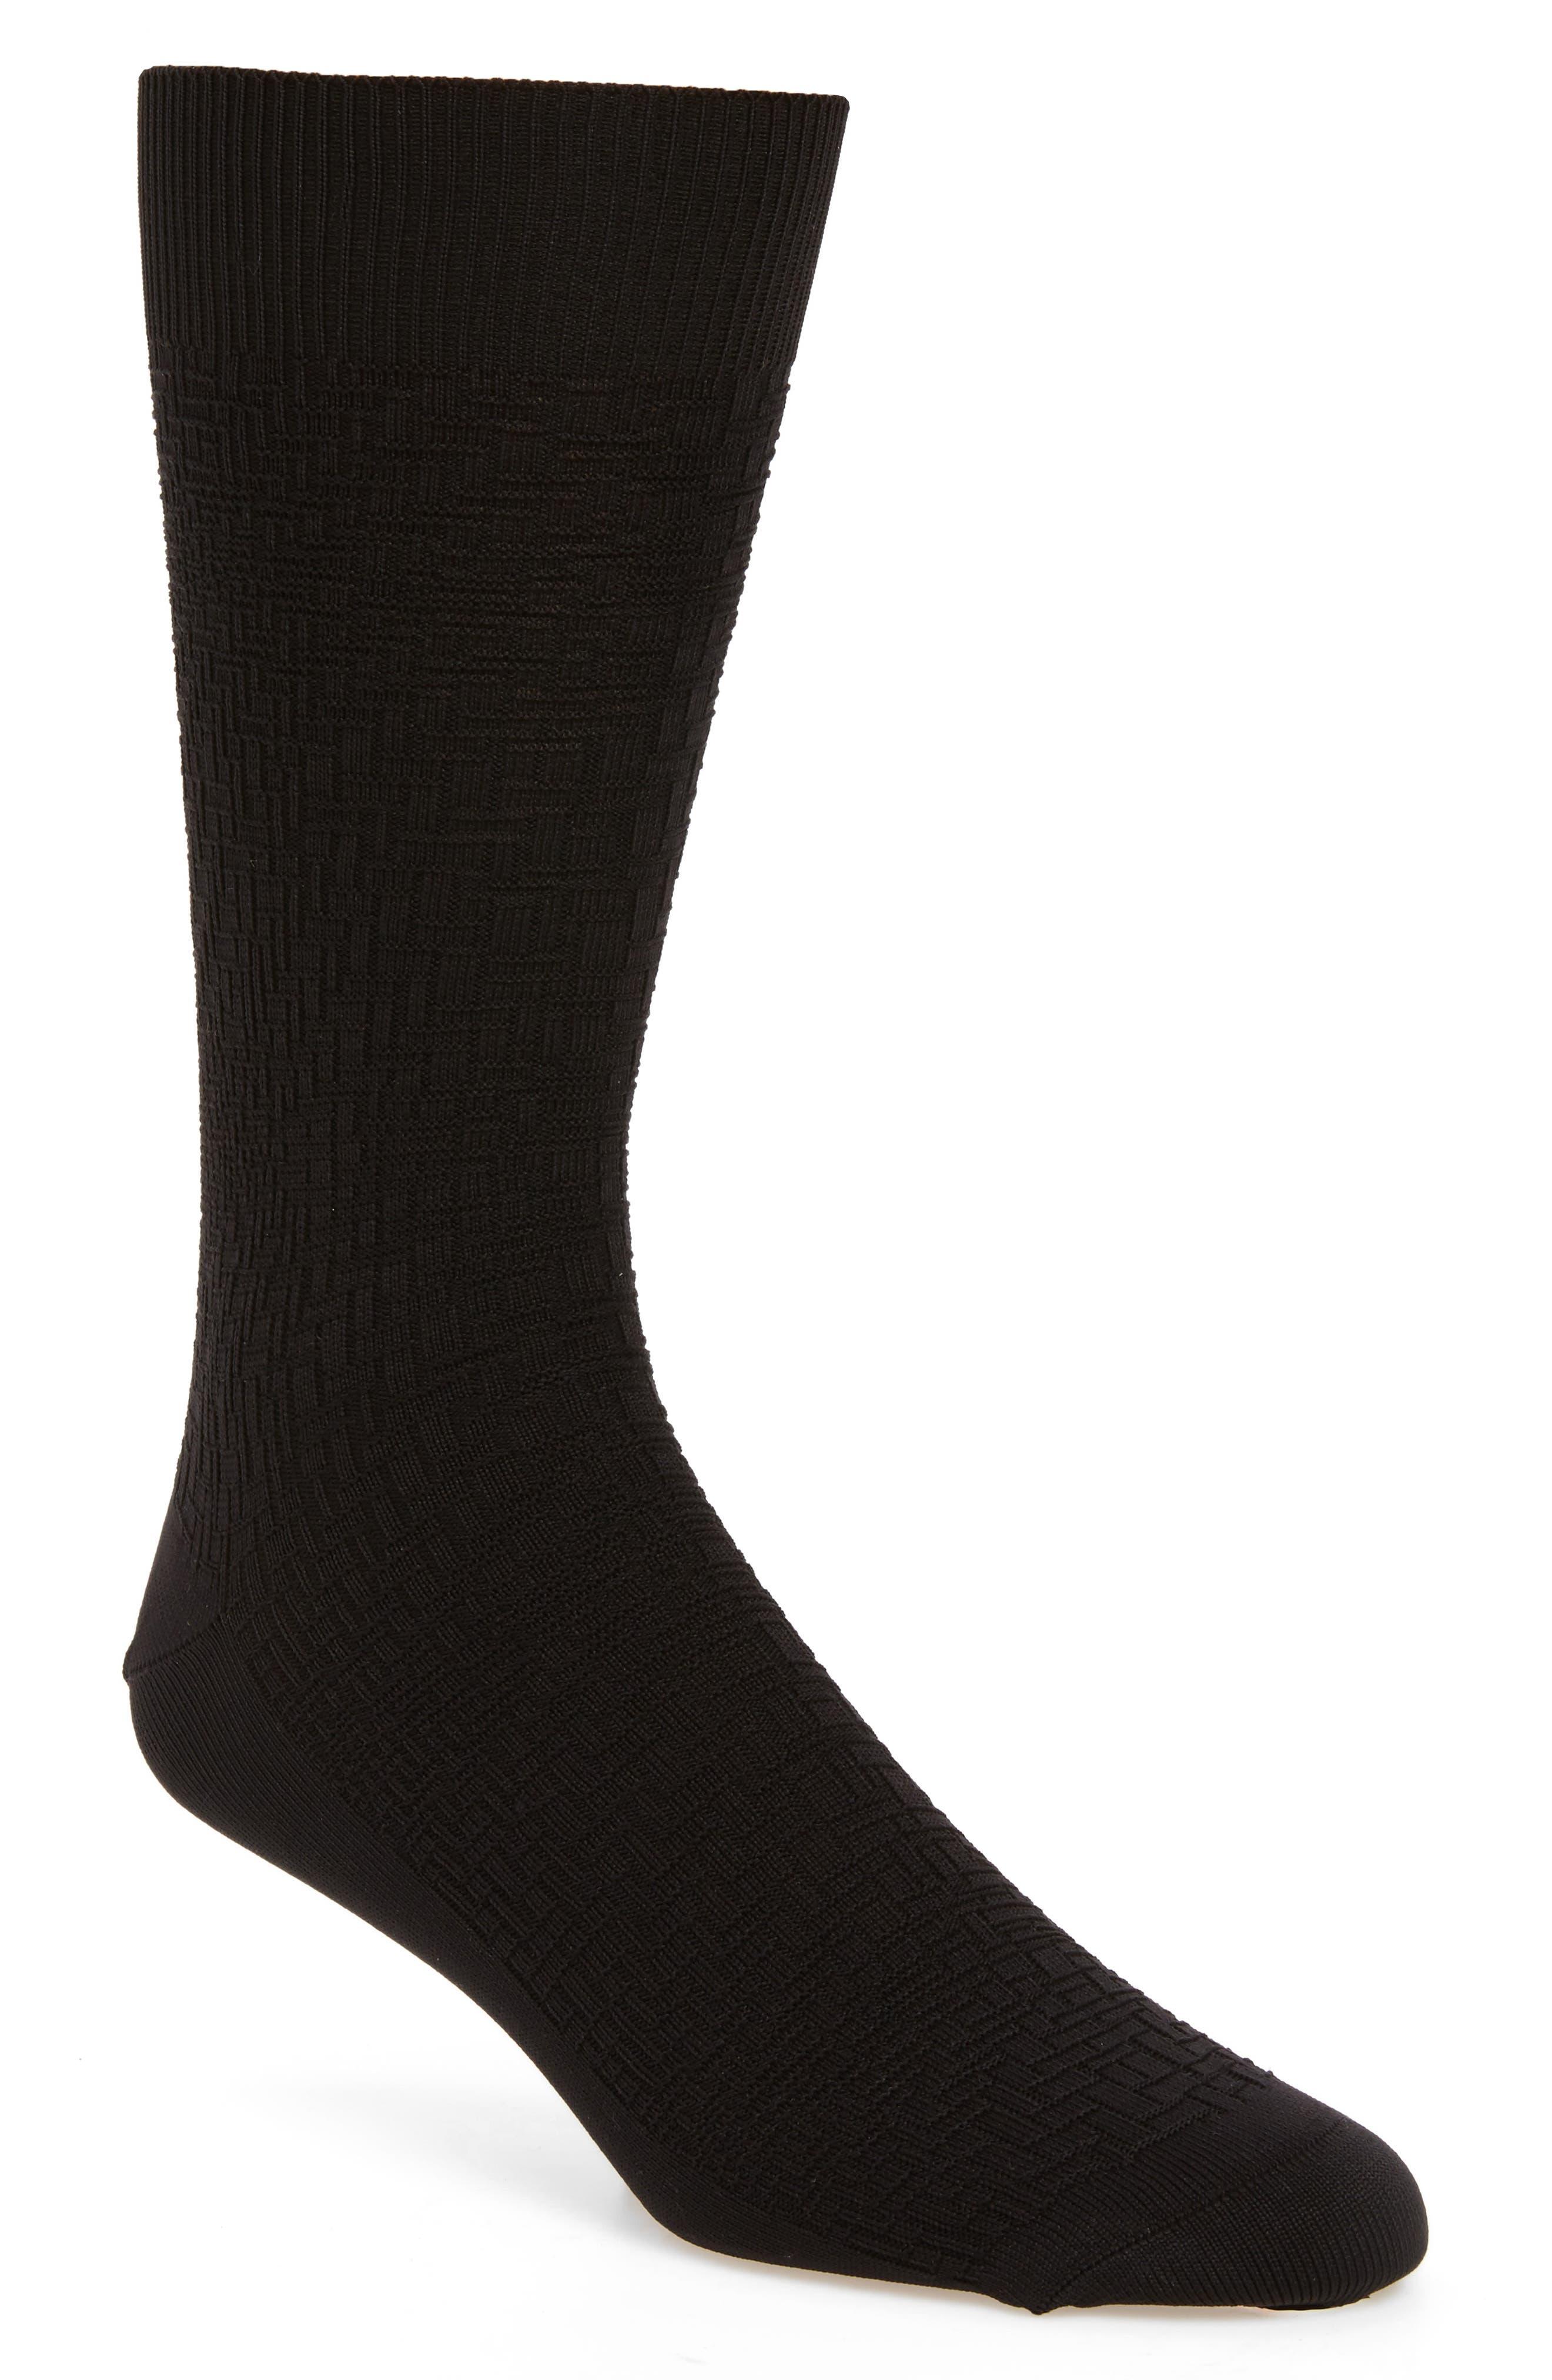 Distorted Texture Crew Socks,                             Main thumbnail 1, color,                             BLACK